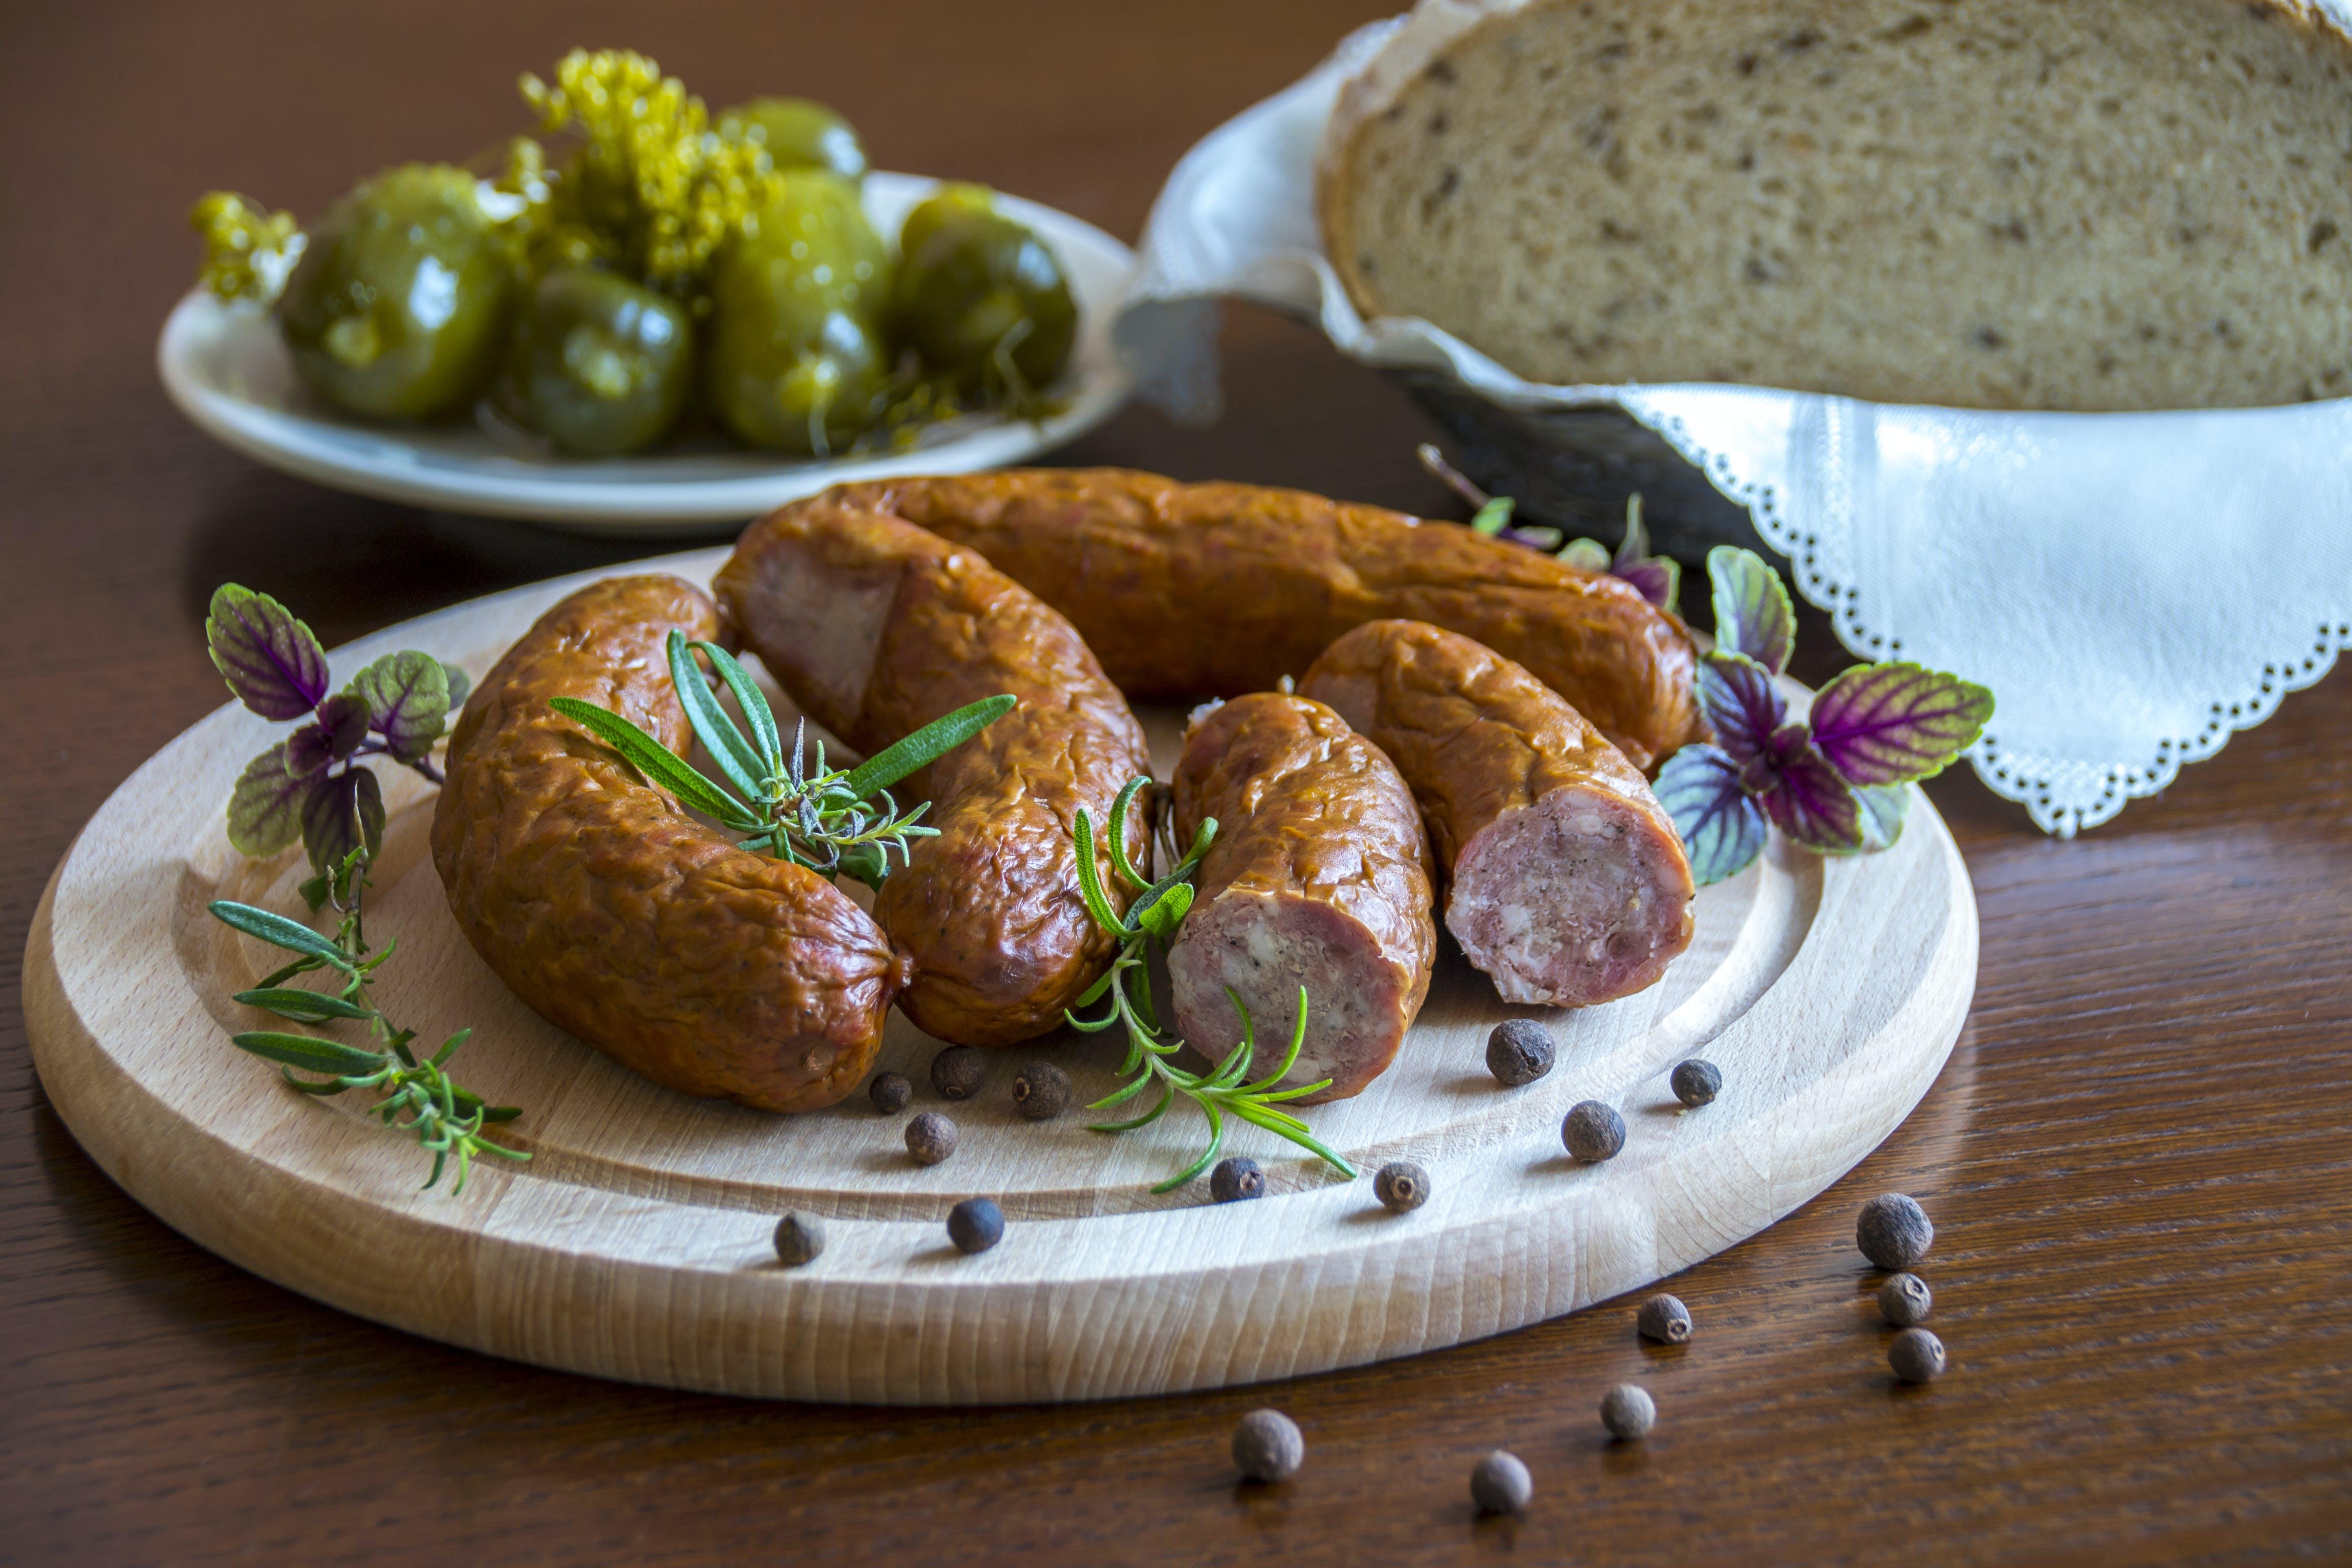 Brown Hotdog on a Brown Plate